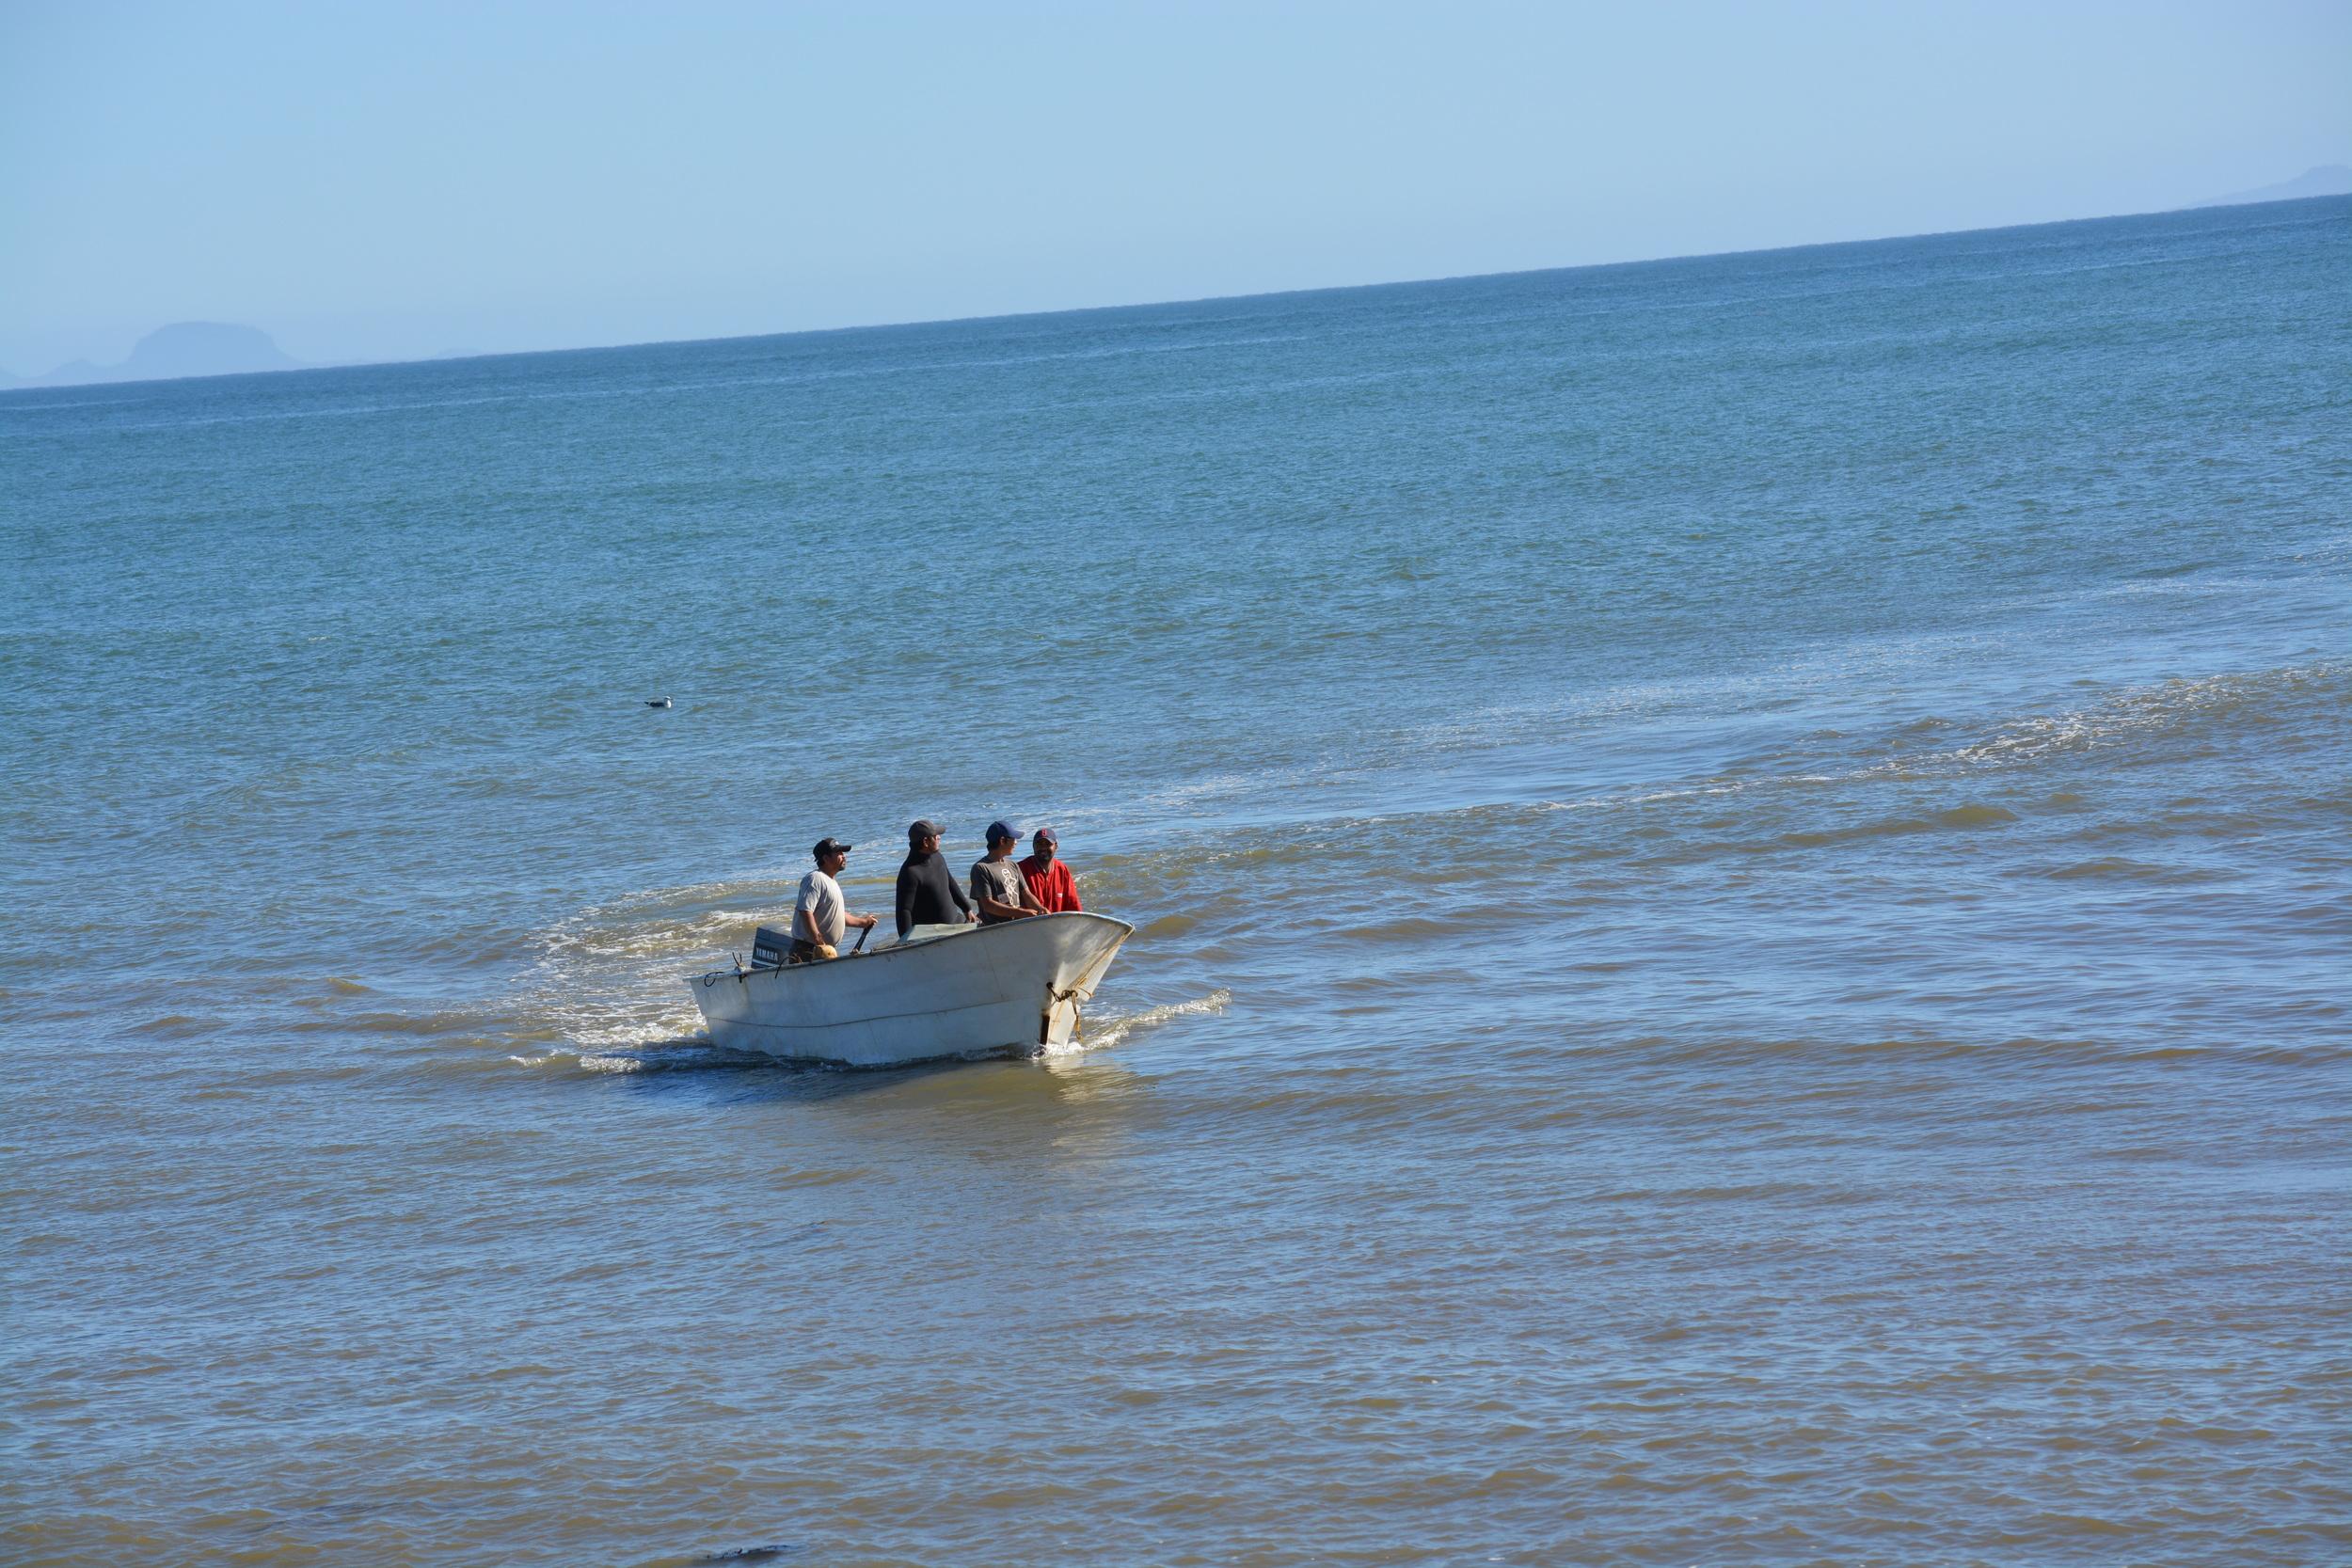 Baja California 10-5-13 Shipwrecks Surfing Adventure Ocean Experience Surf School San Diego (75).JPG